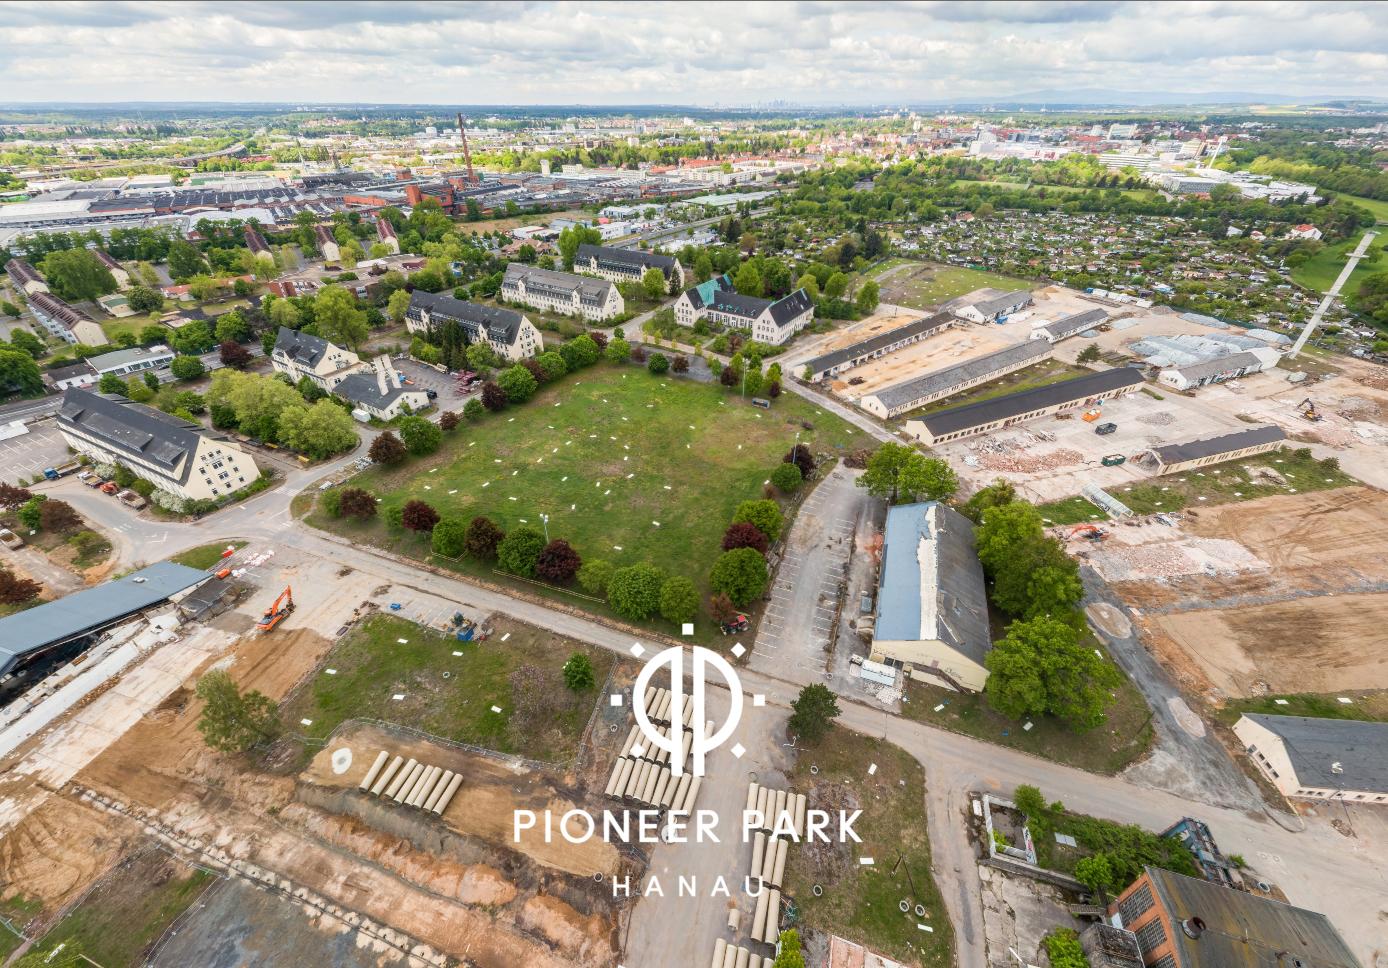 Pioneer Park Hanau (2020-21)